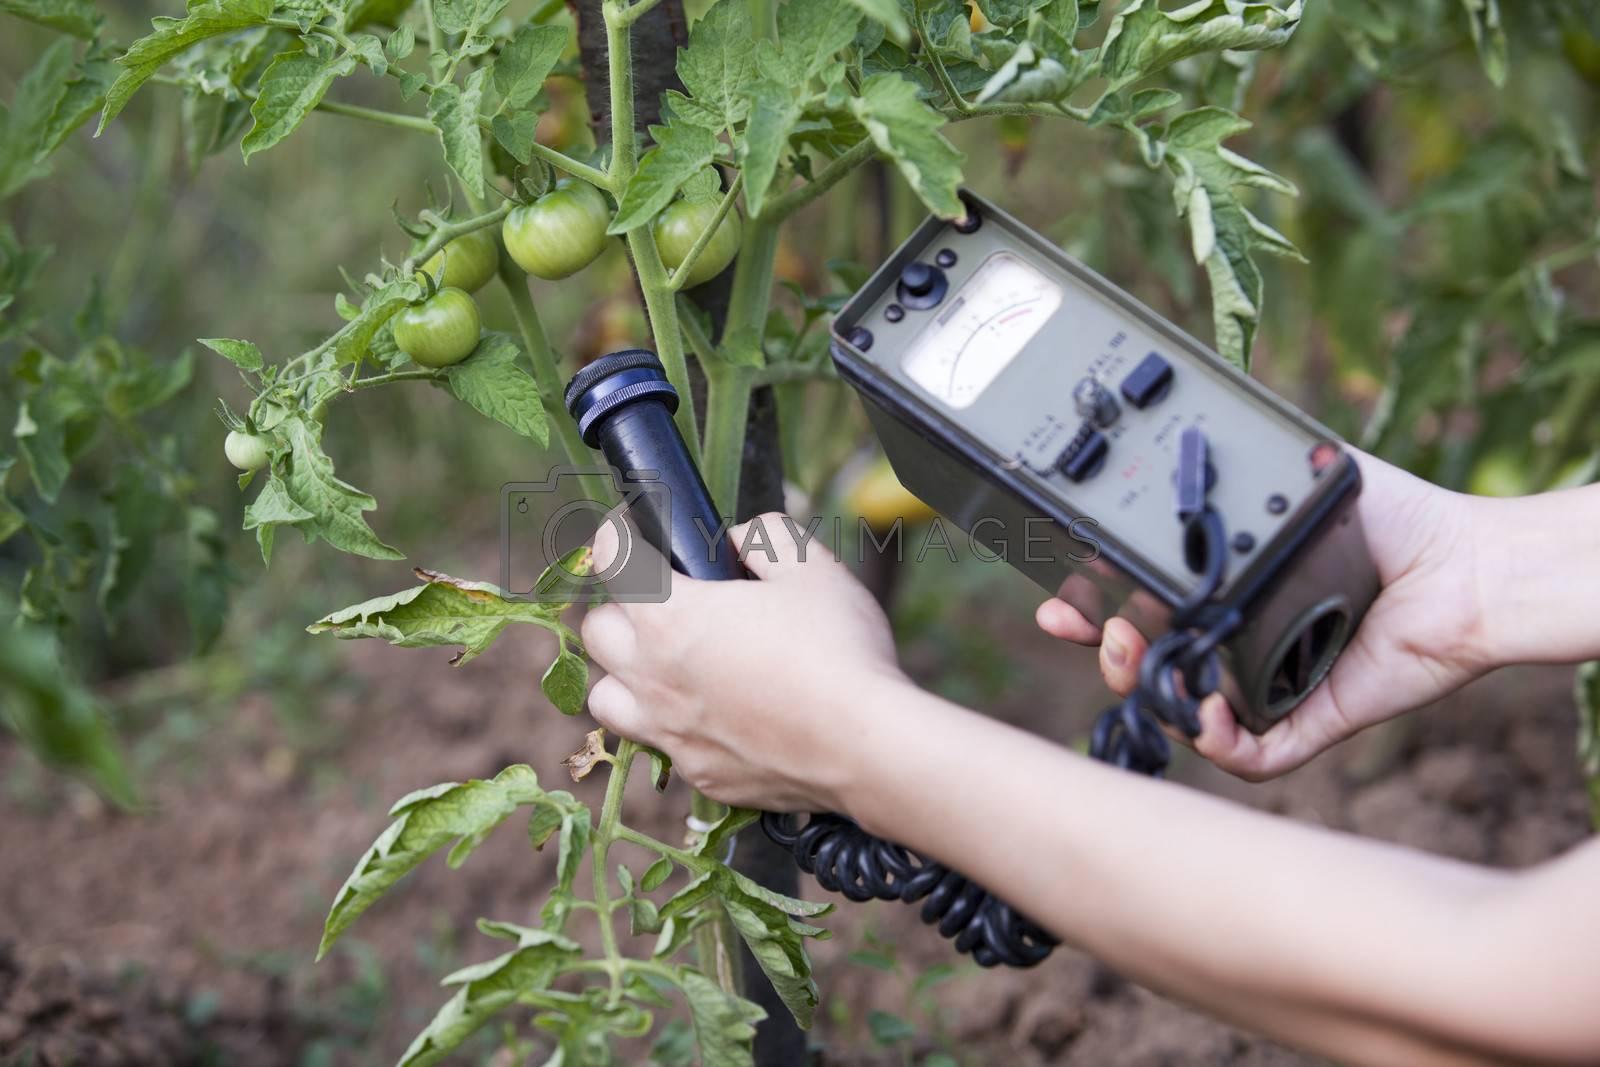 Measuring radiation levels of tomato